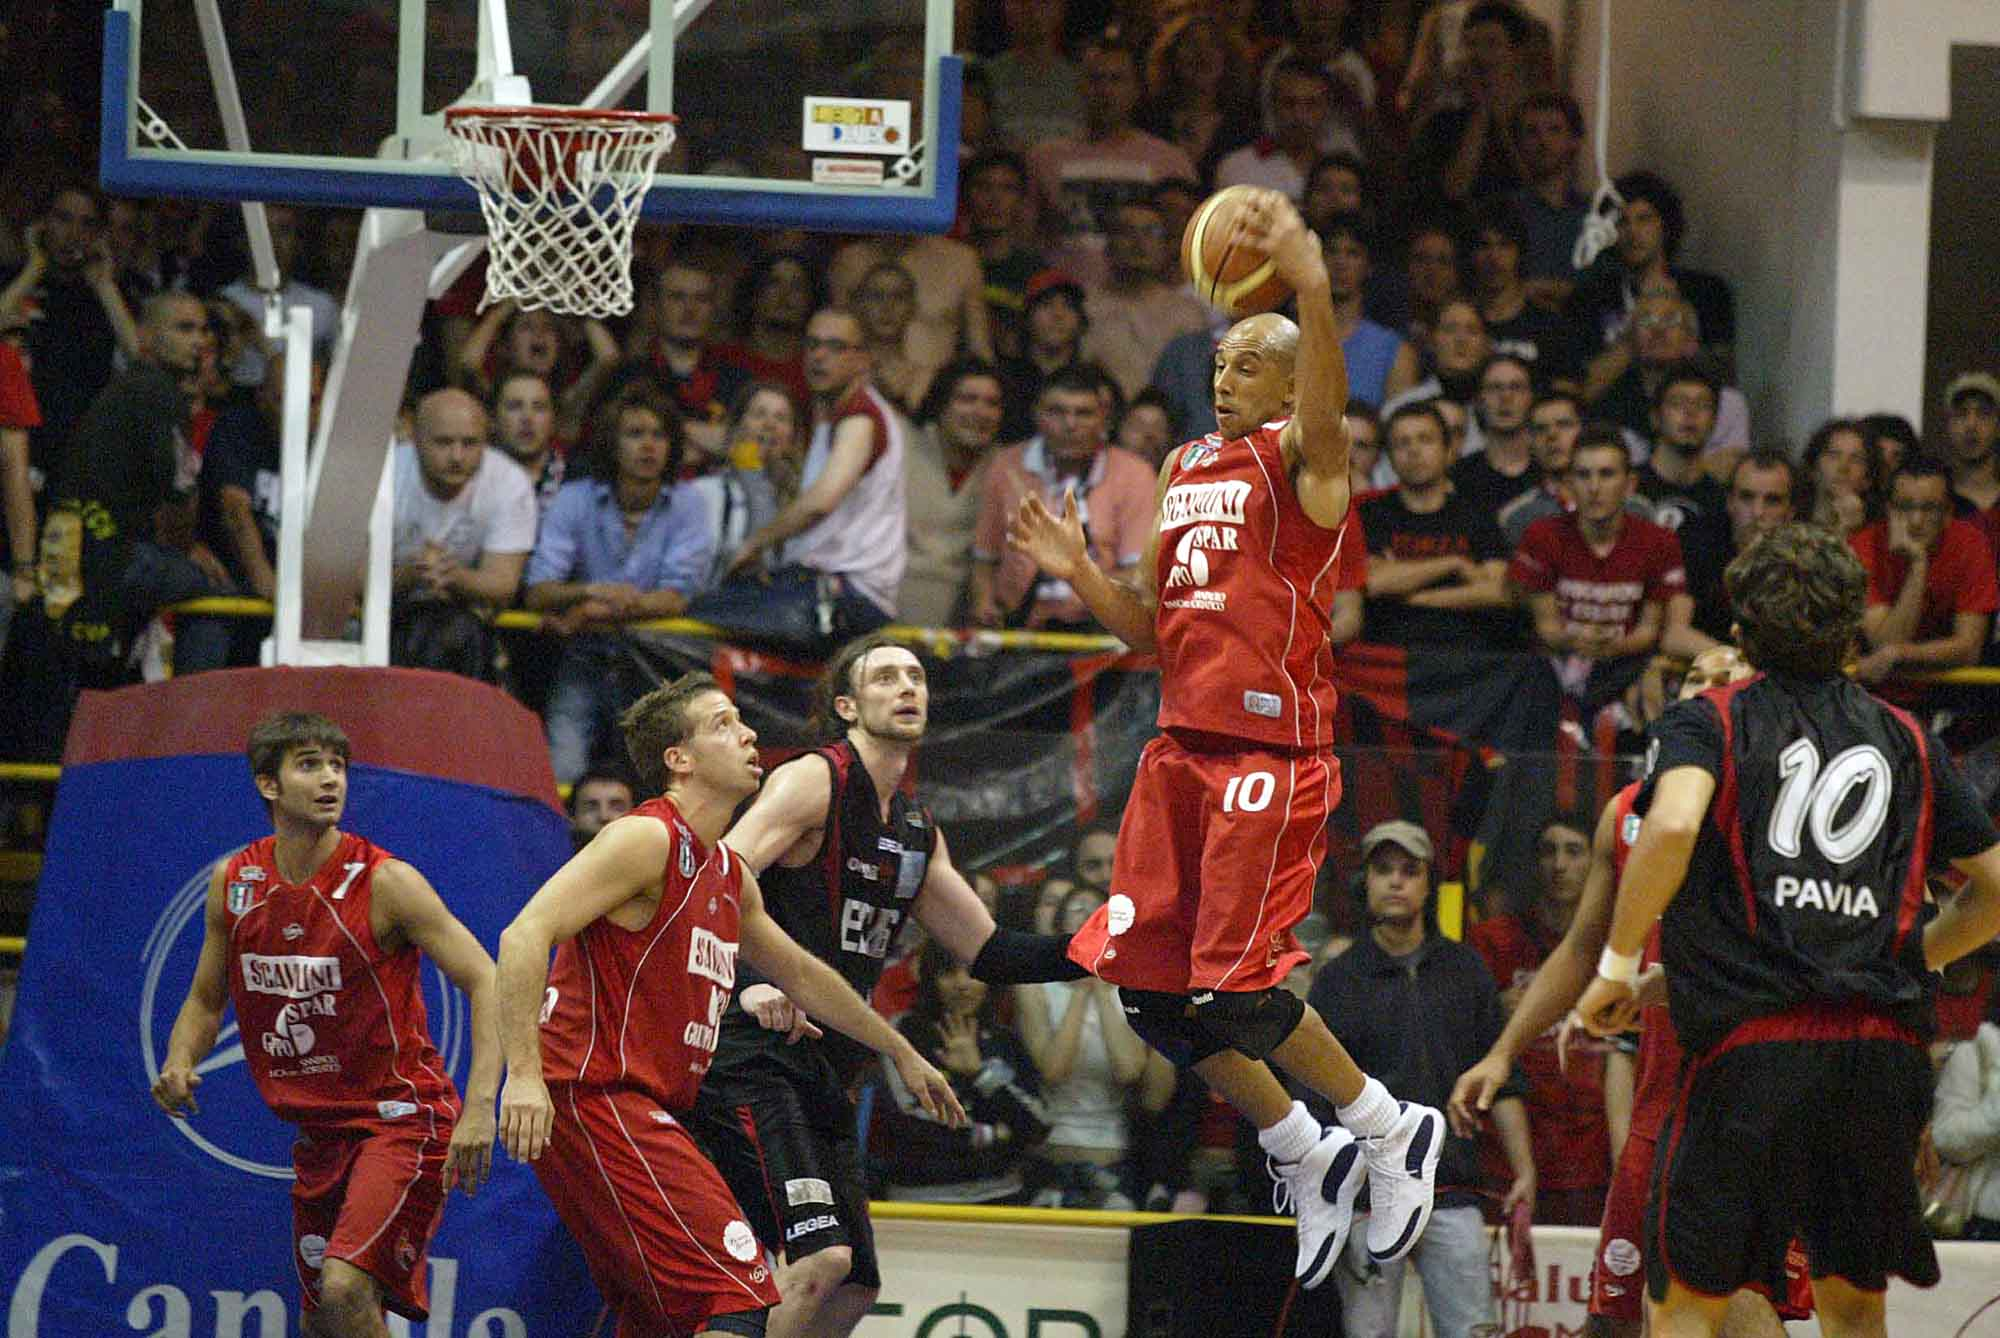 Calendario Legadue Basket.Mondobasket It Edimes Pavia Scavolini Pesaro 104 106 1 2